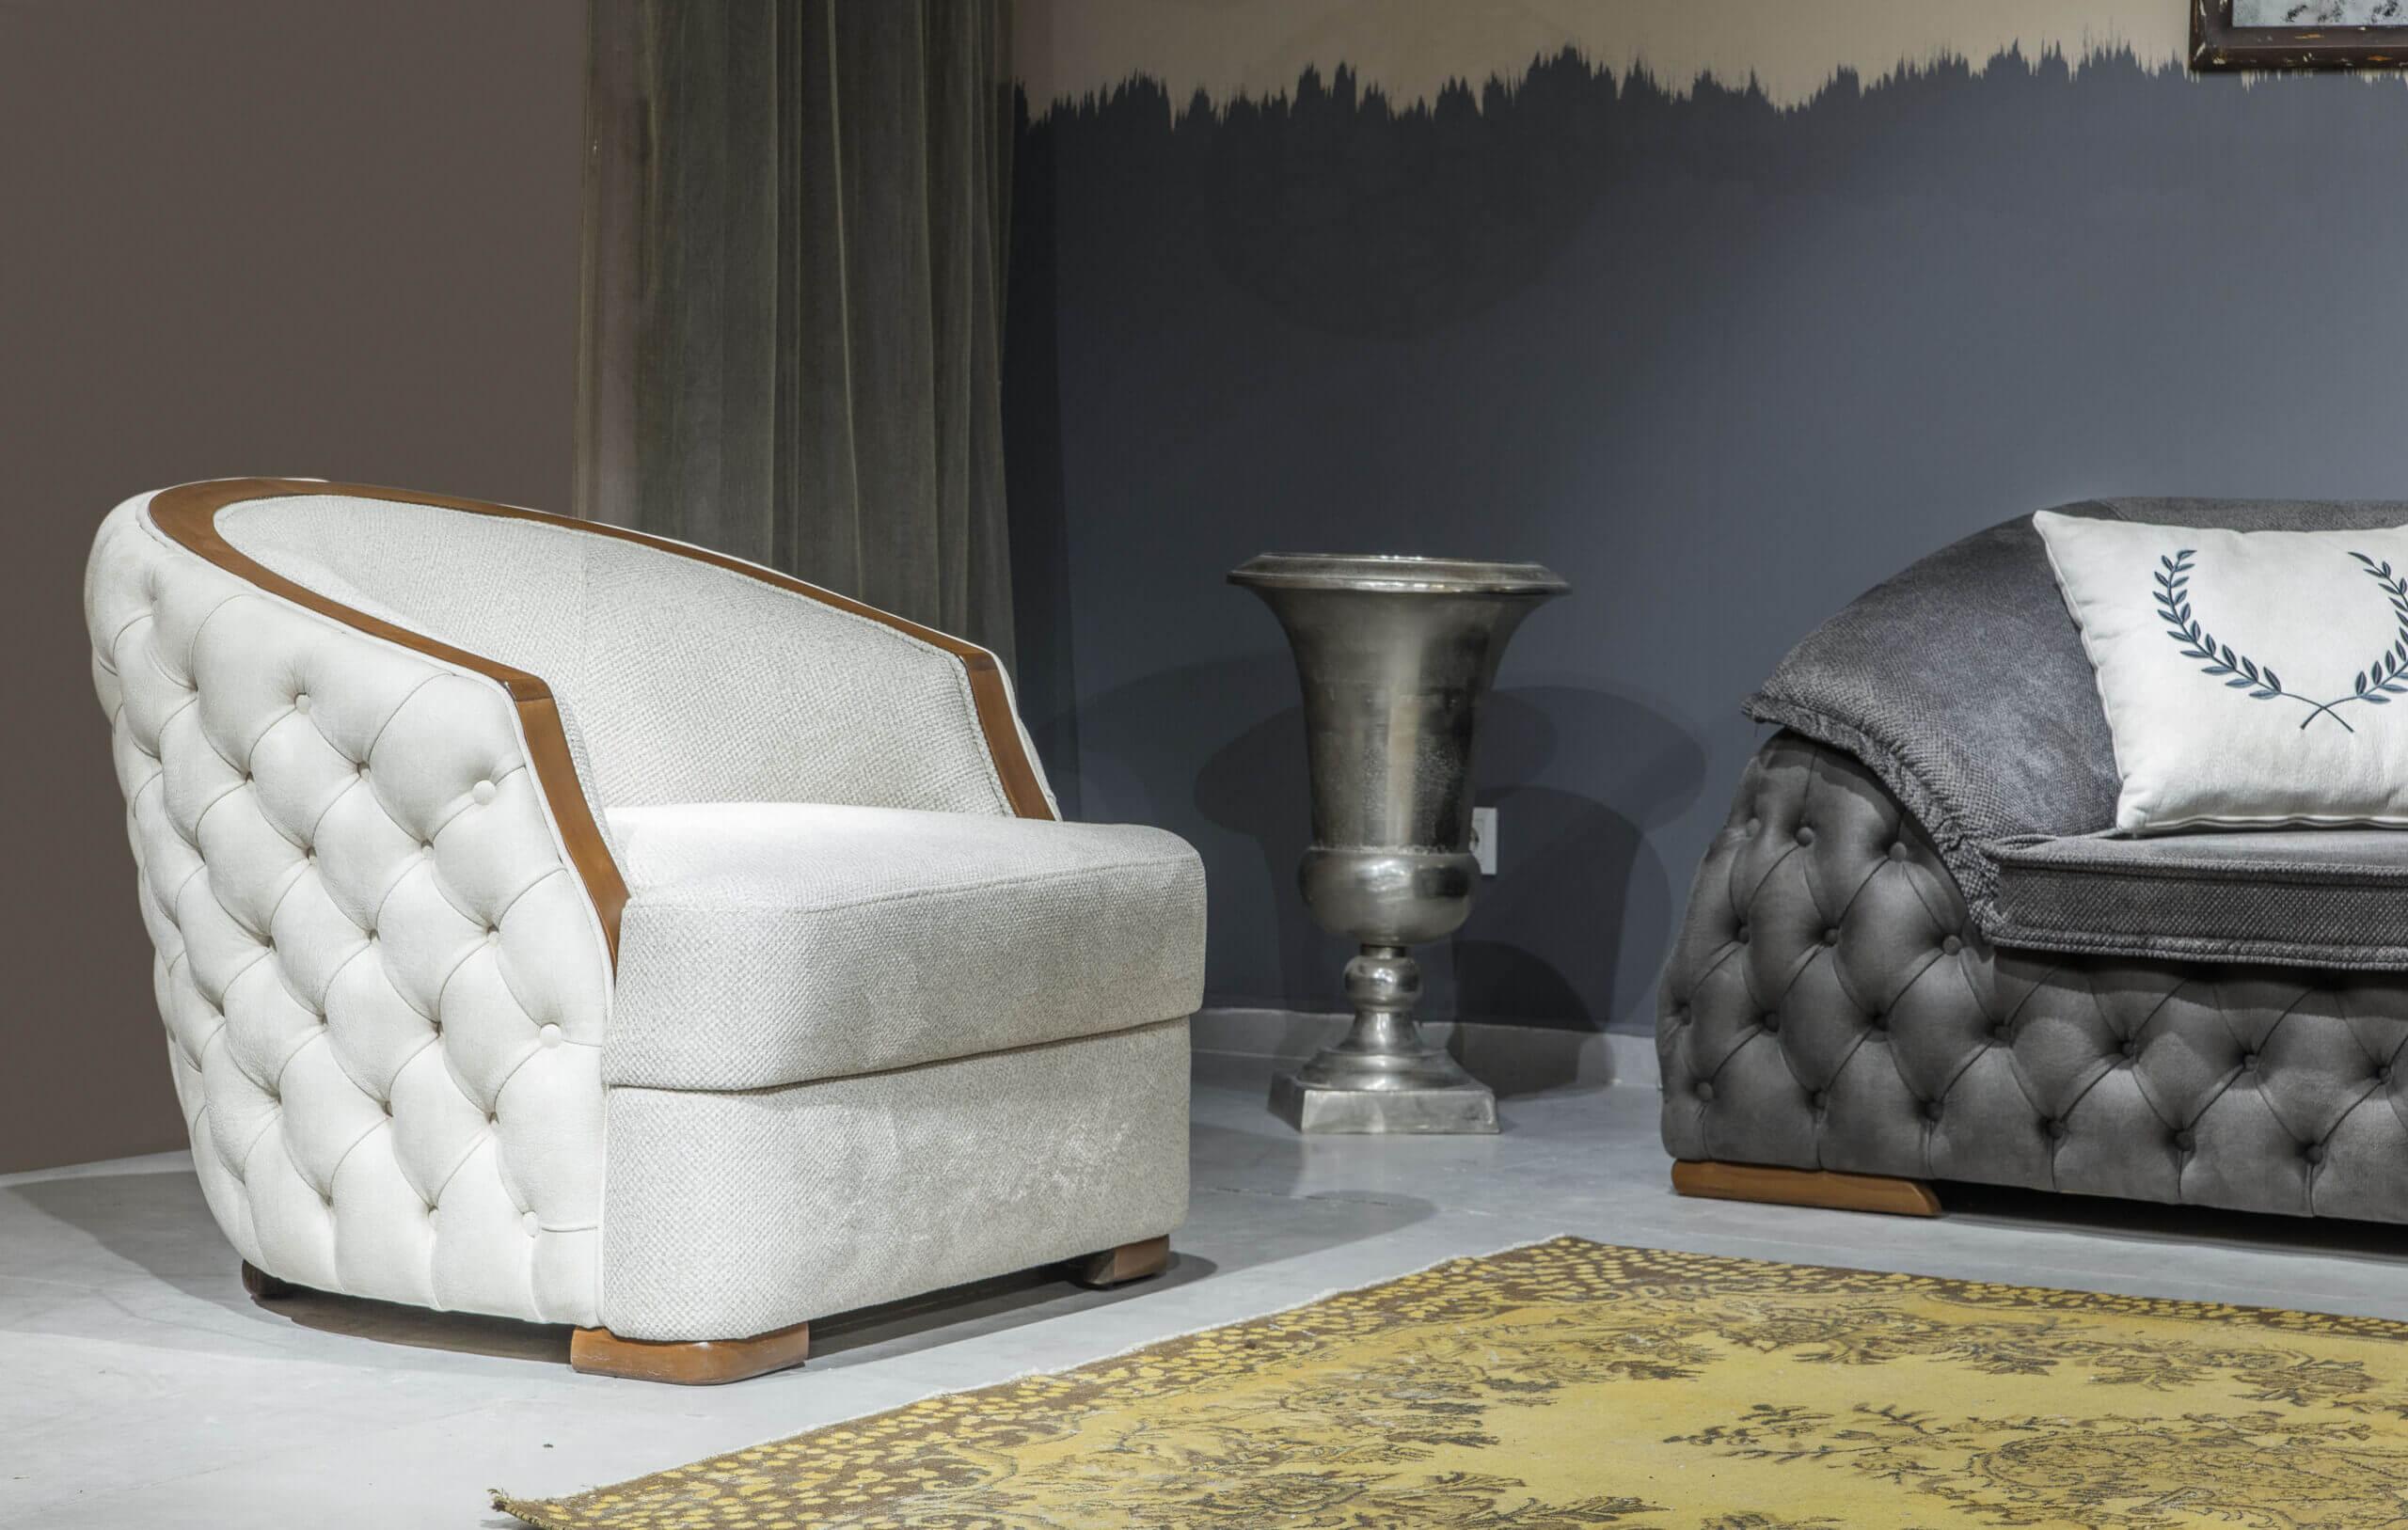 Sofa 2 - Foto 2